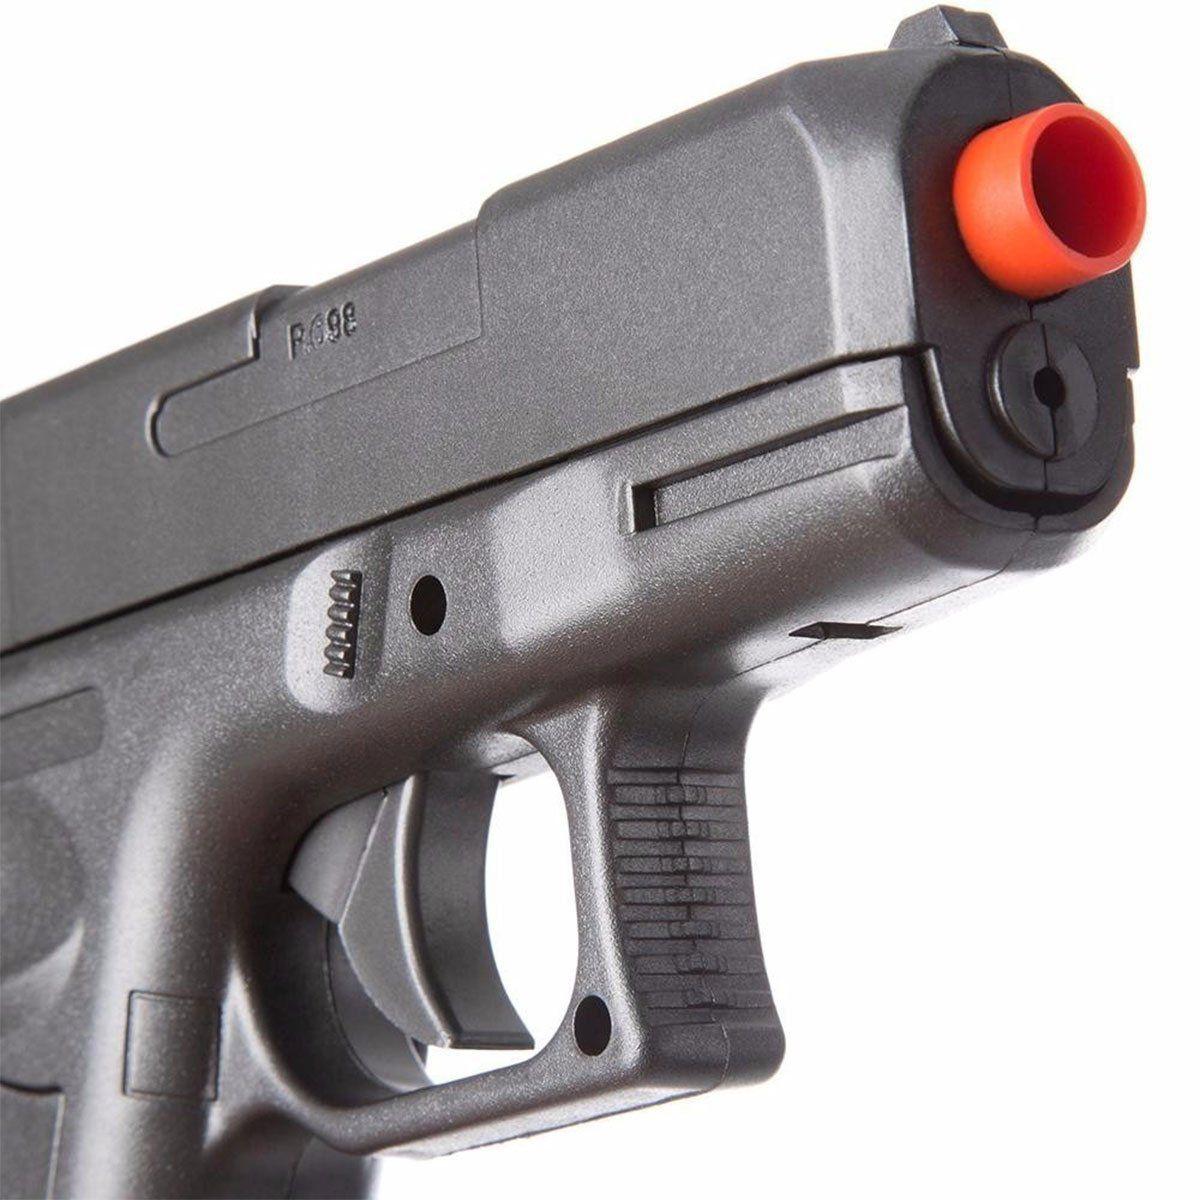 Pistola de Airsoft Cyma P698 Spring 6mm